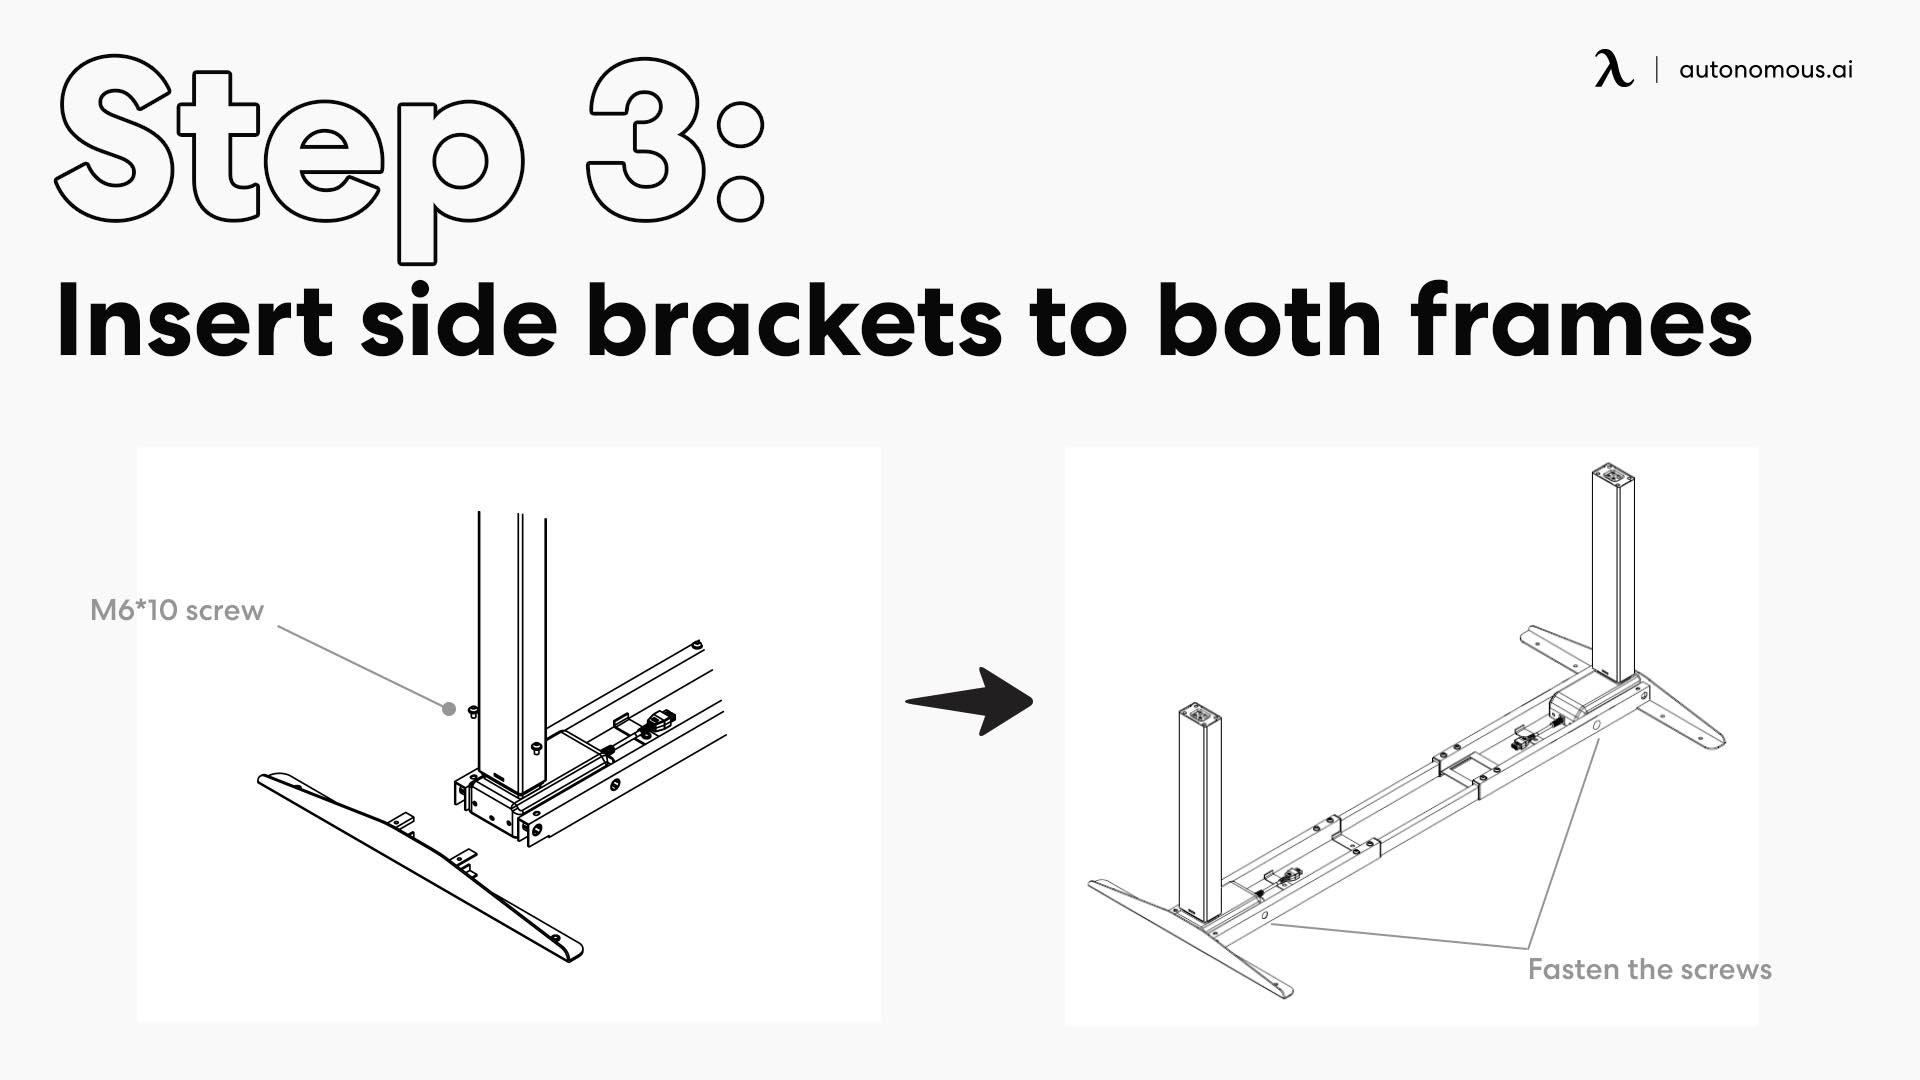 Insert the side bracket